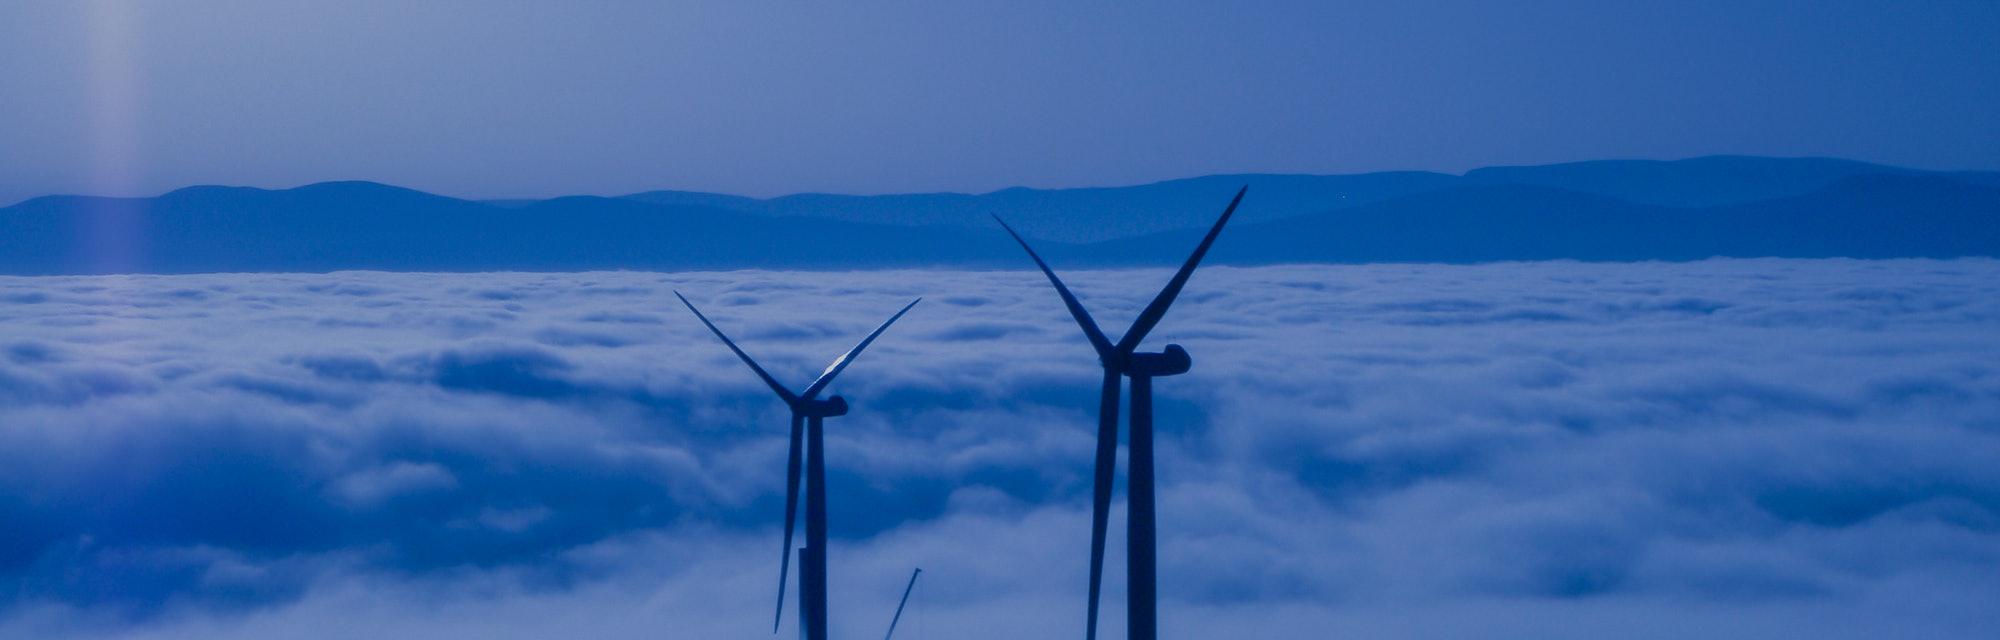 Wind turbines in Scotland.